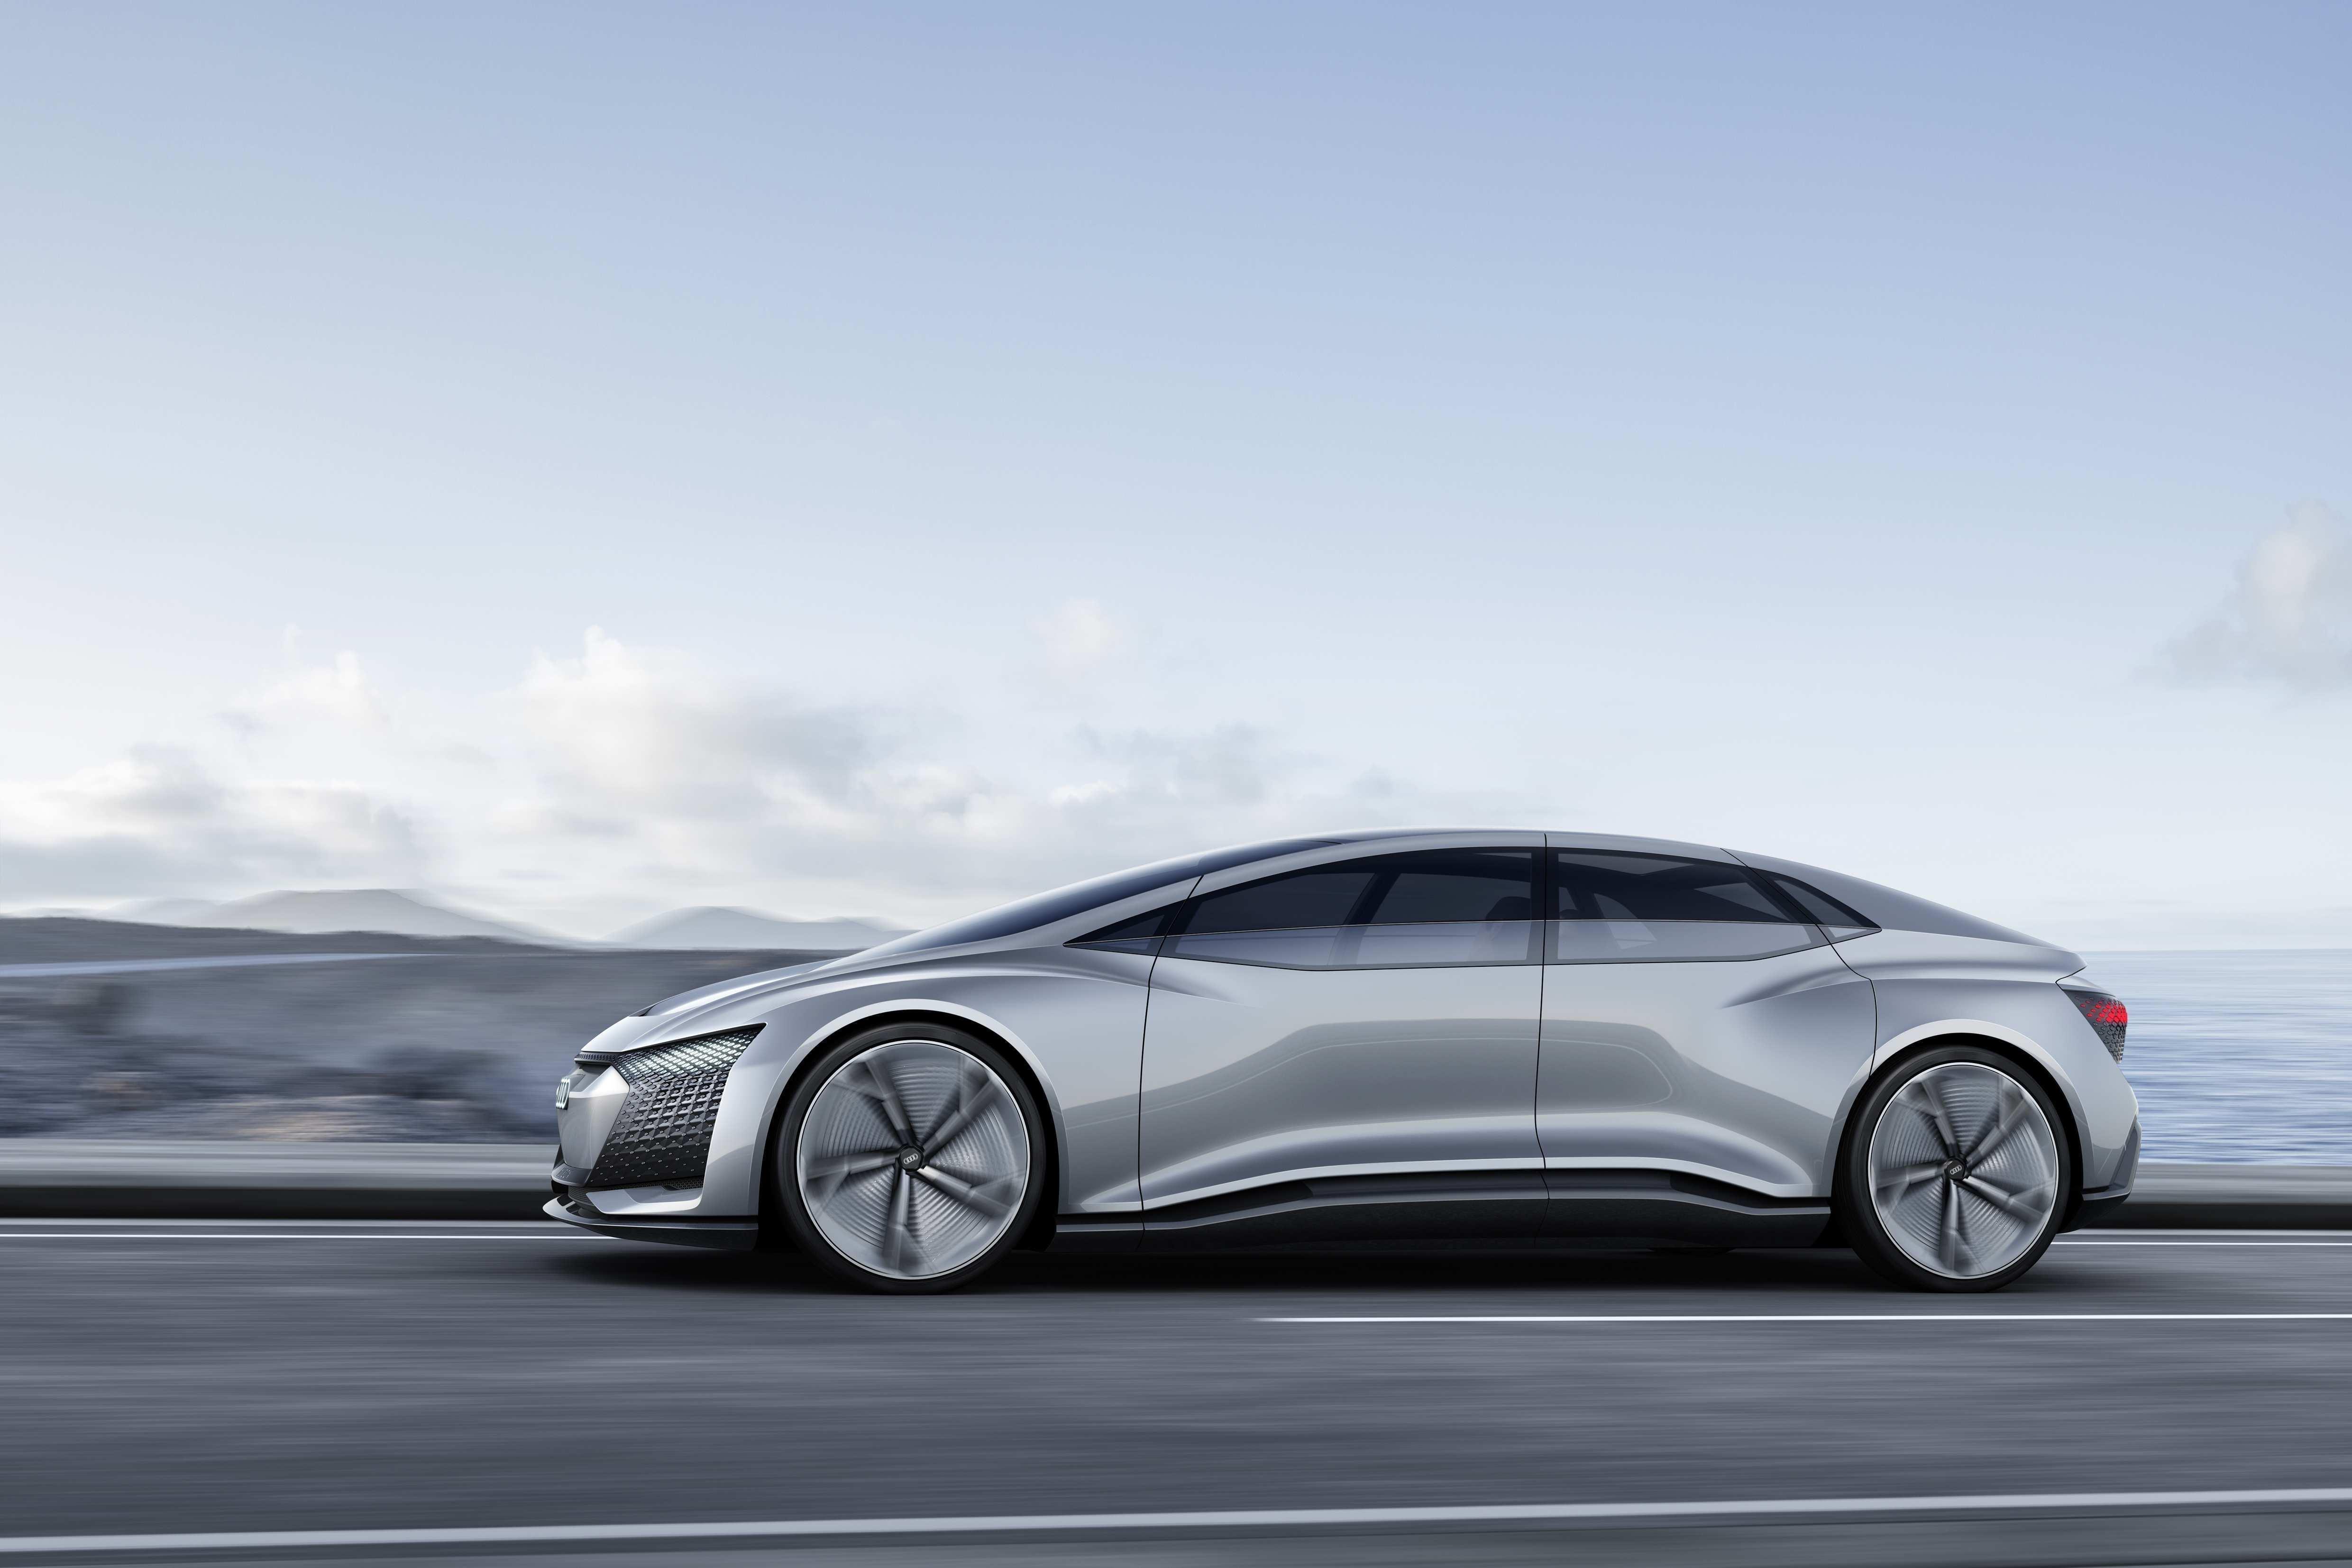 81 New Audi 2020 Self Driving Car Photos by Audi 2020 Self Driving Car